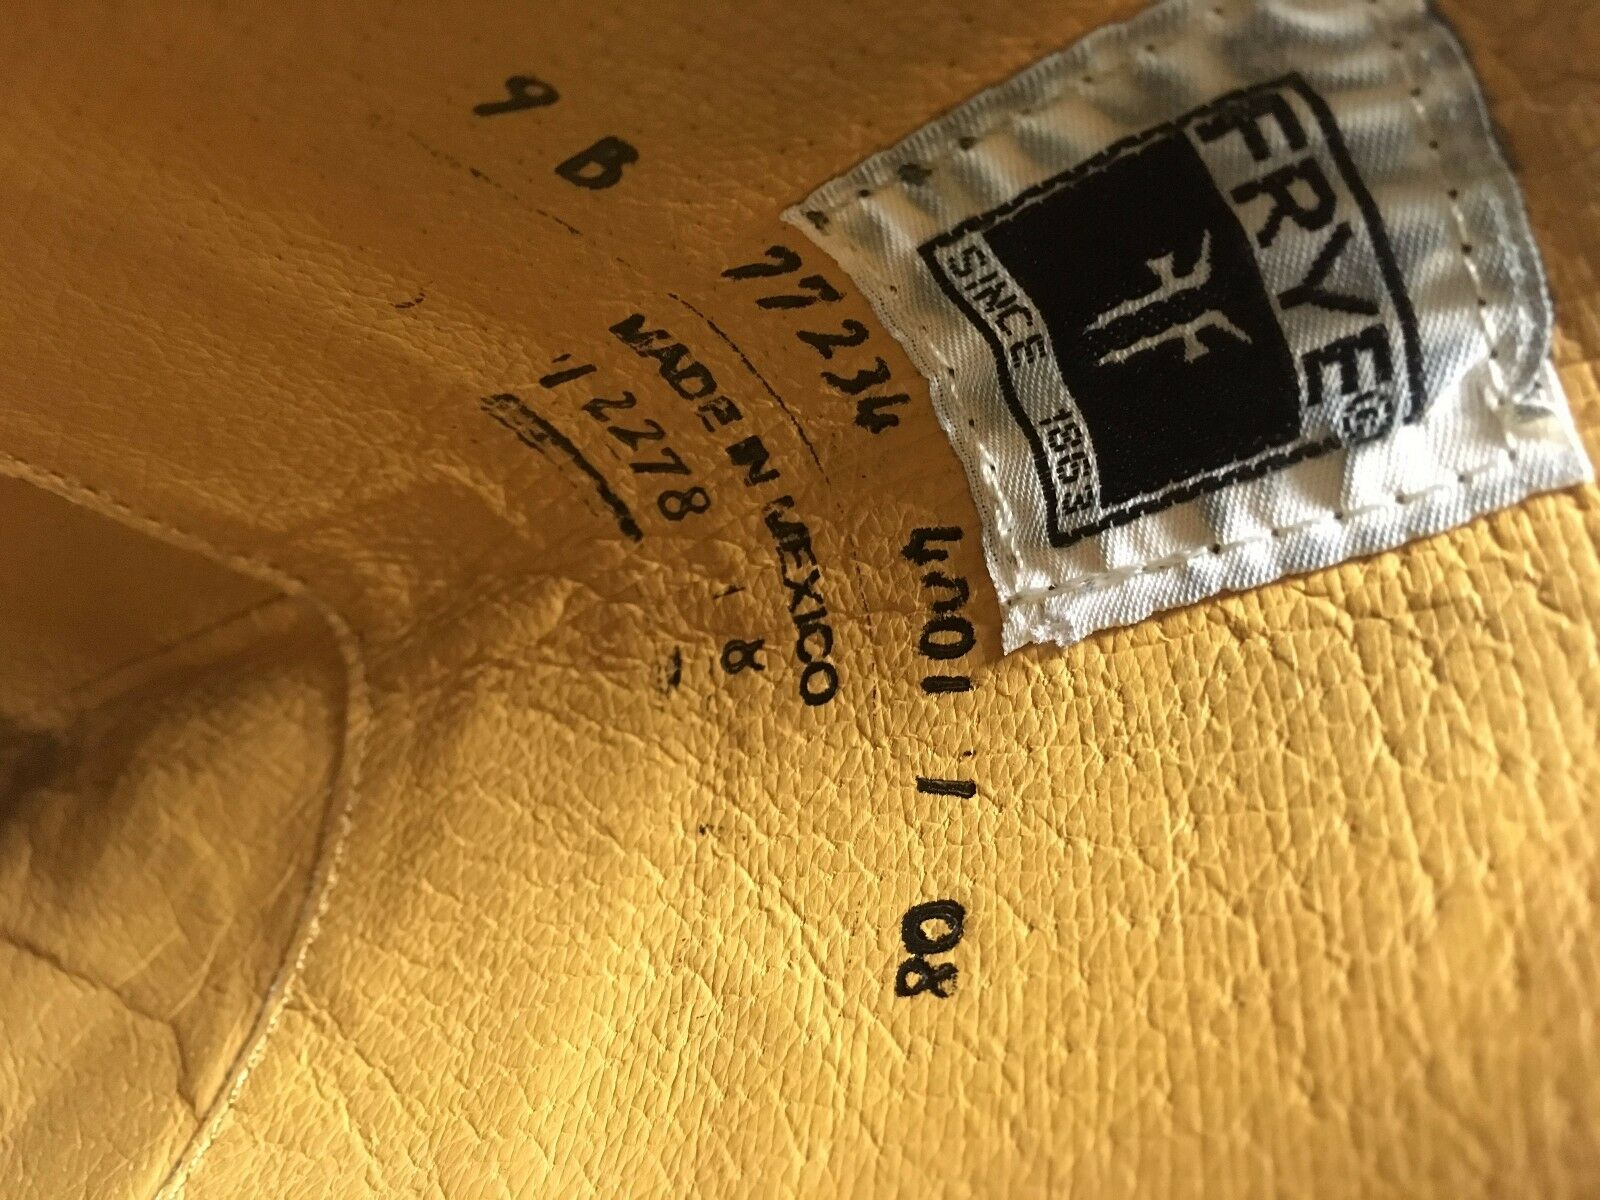 FRYE Größe 4001 Dark braun braun braun JANE 77234 Tall Stiefel 9 B c191ef